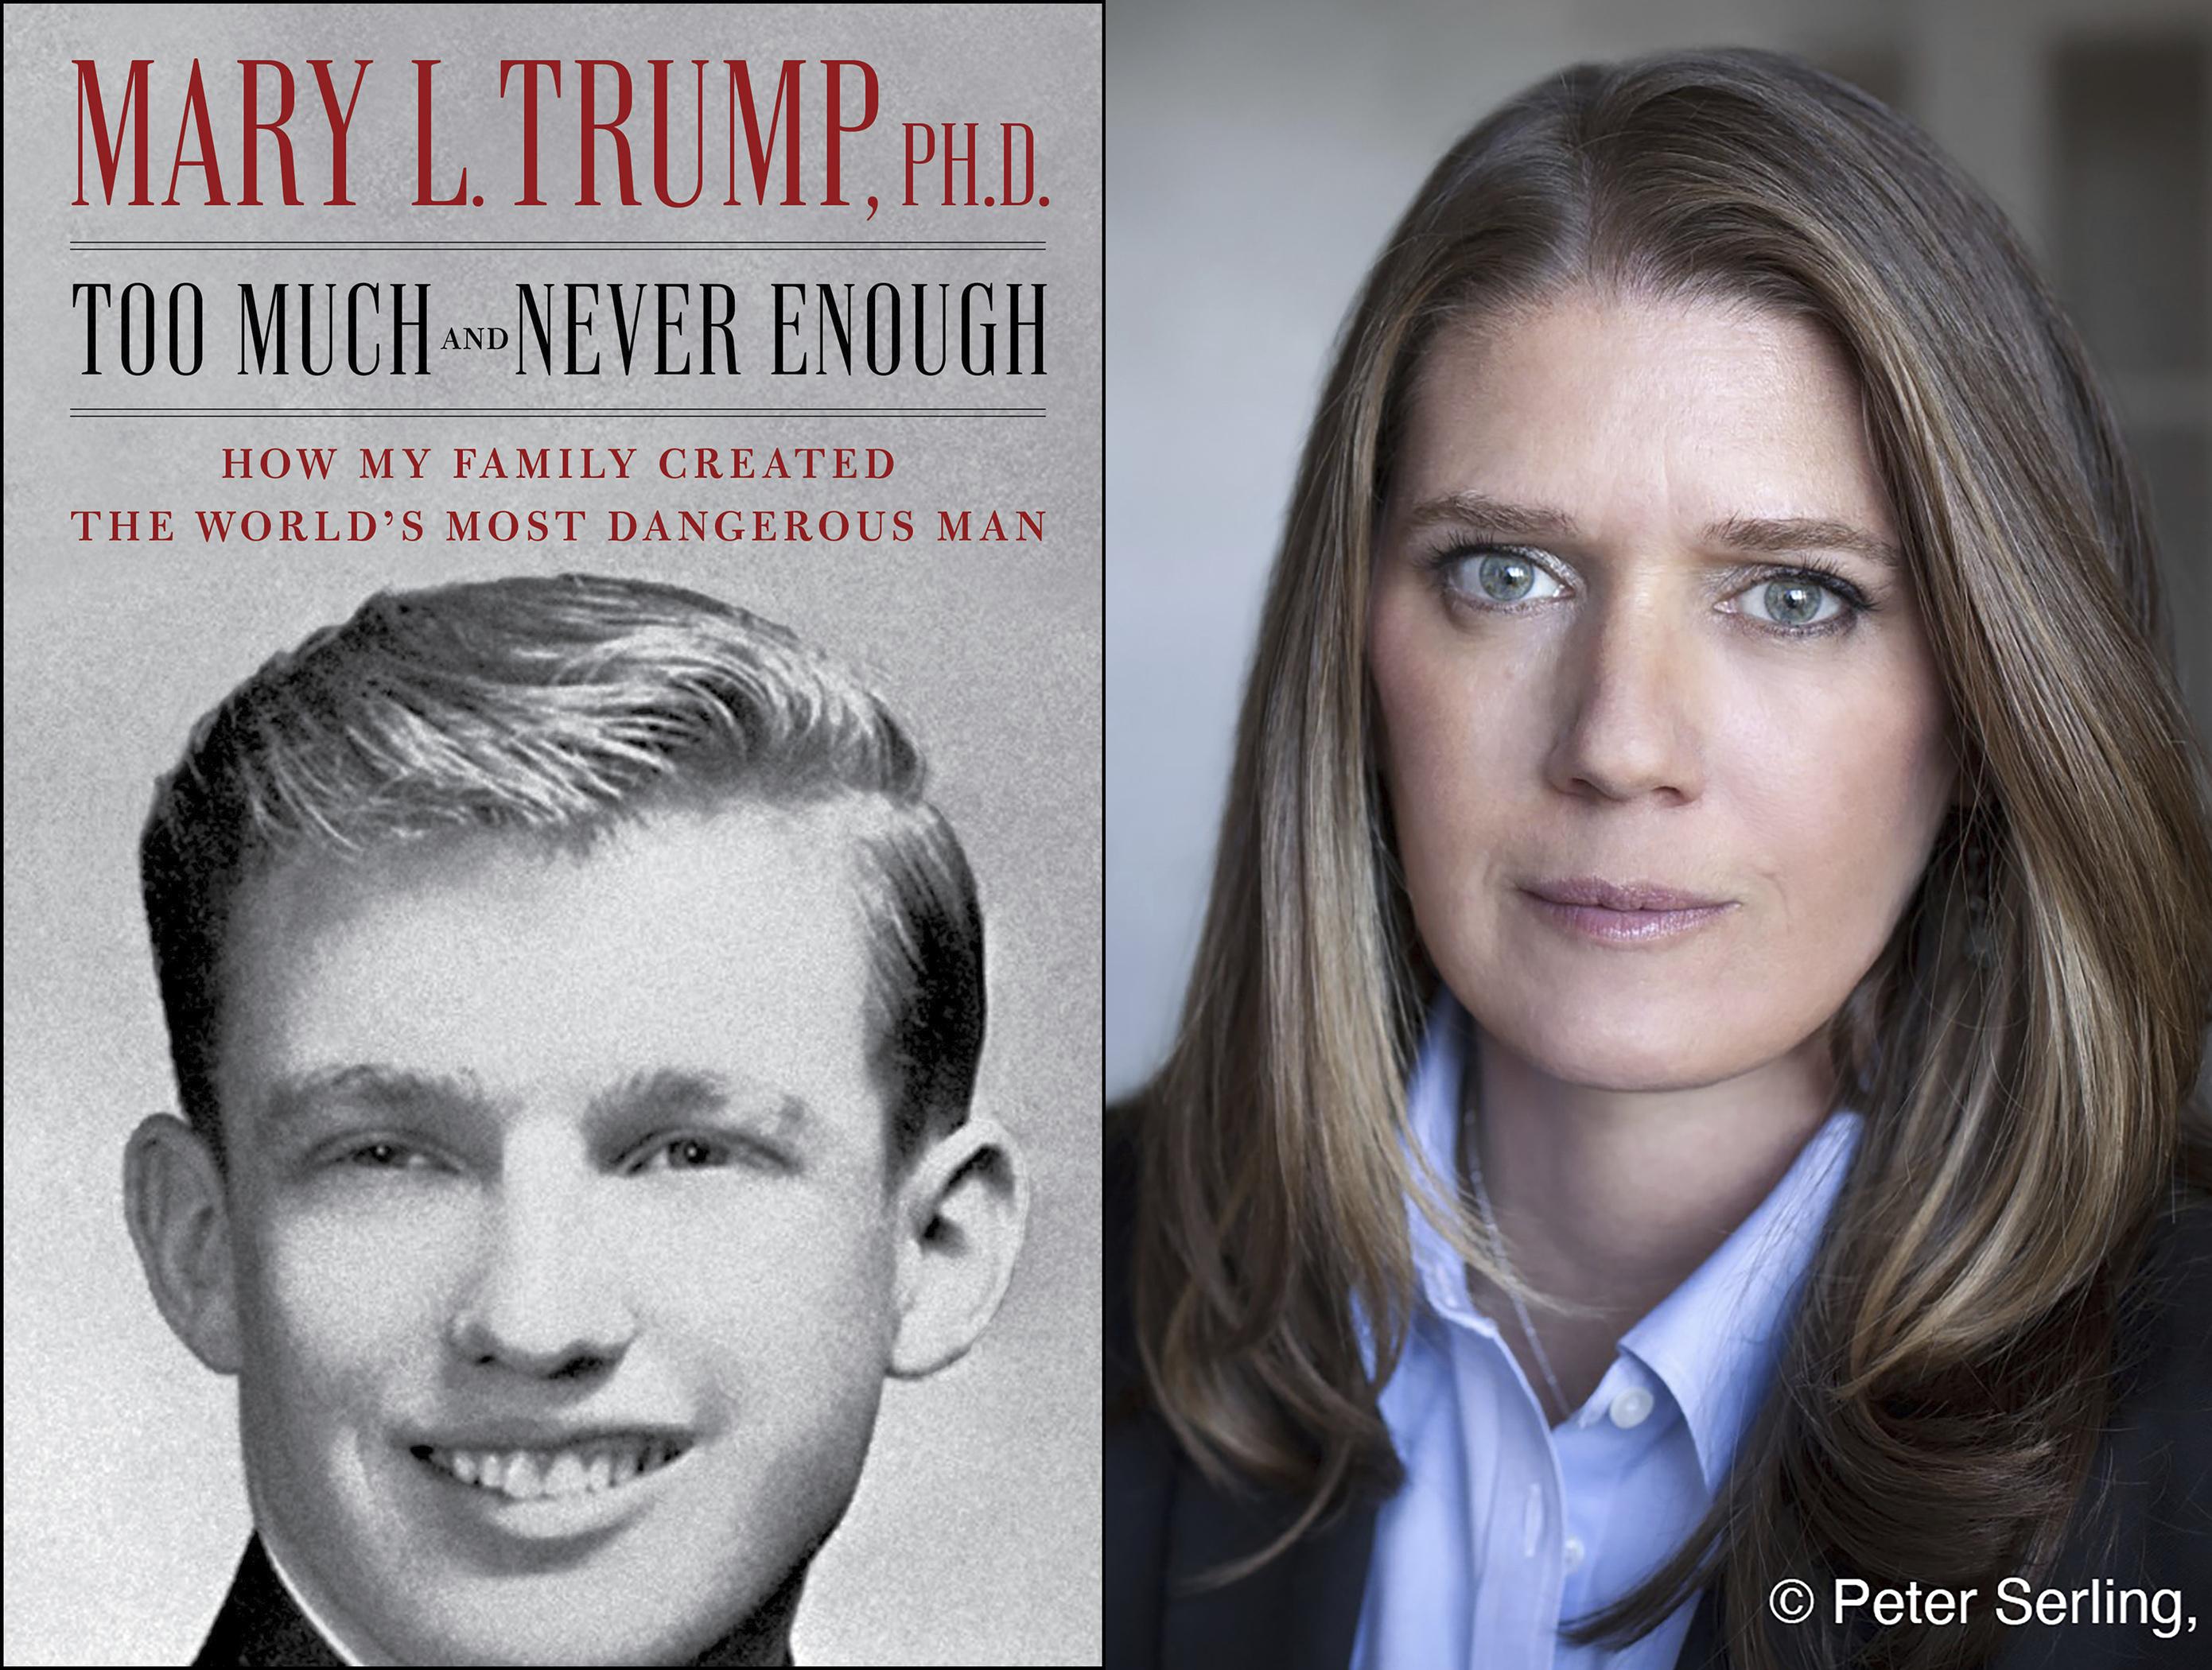 Mary Trump Says She's Heard The President Use N-Word & Anti-Semitic Slurs